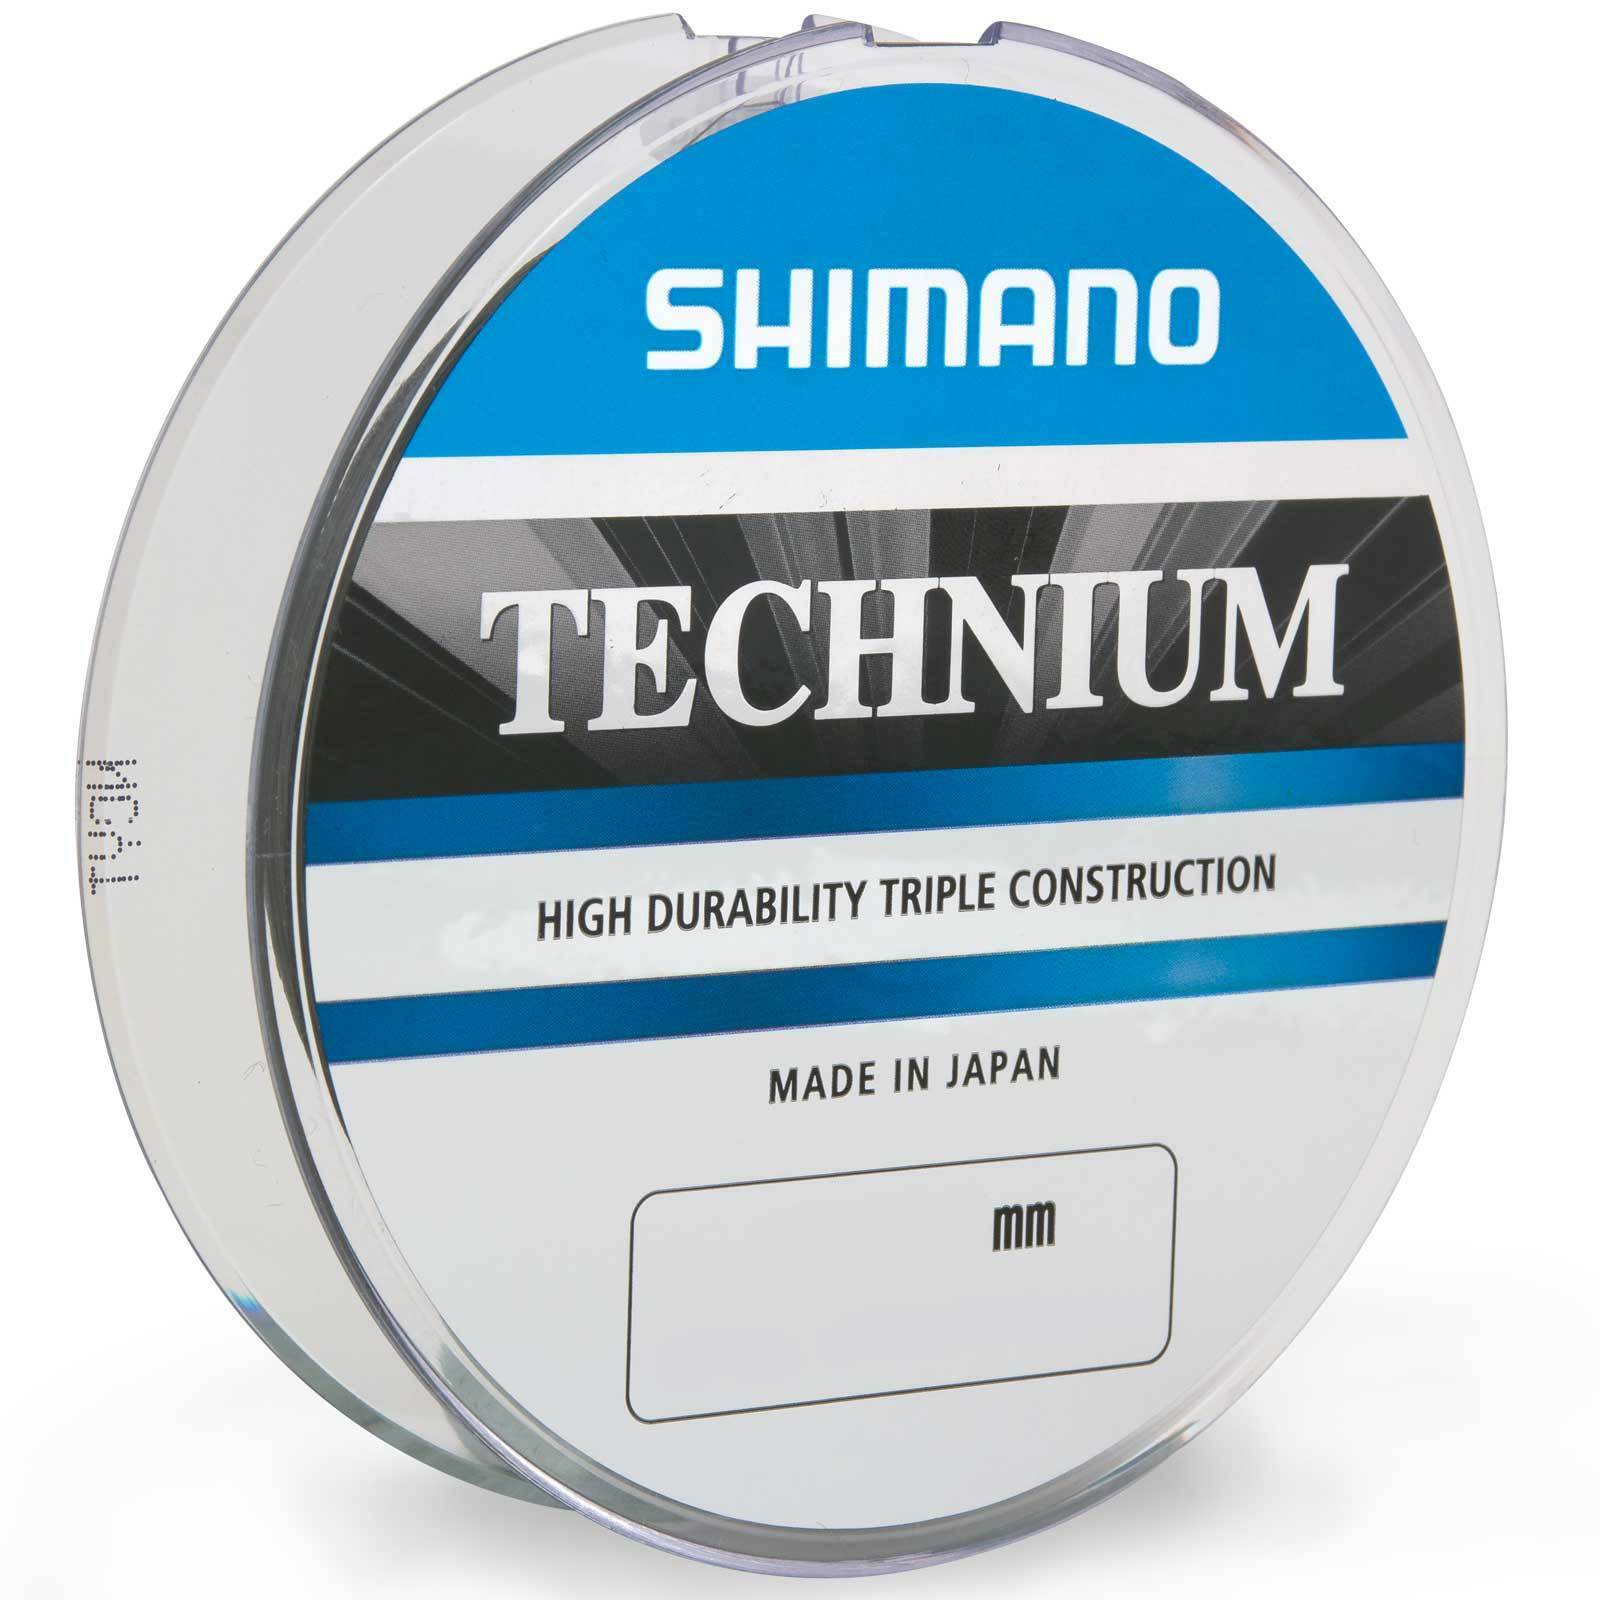 (0,02eur m) Shimano carpa filo lenza TECHNIUM GRIGIO SCURO 1530m 0,25mm